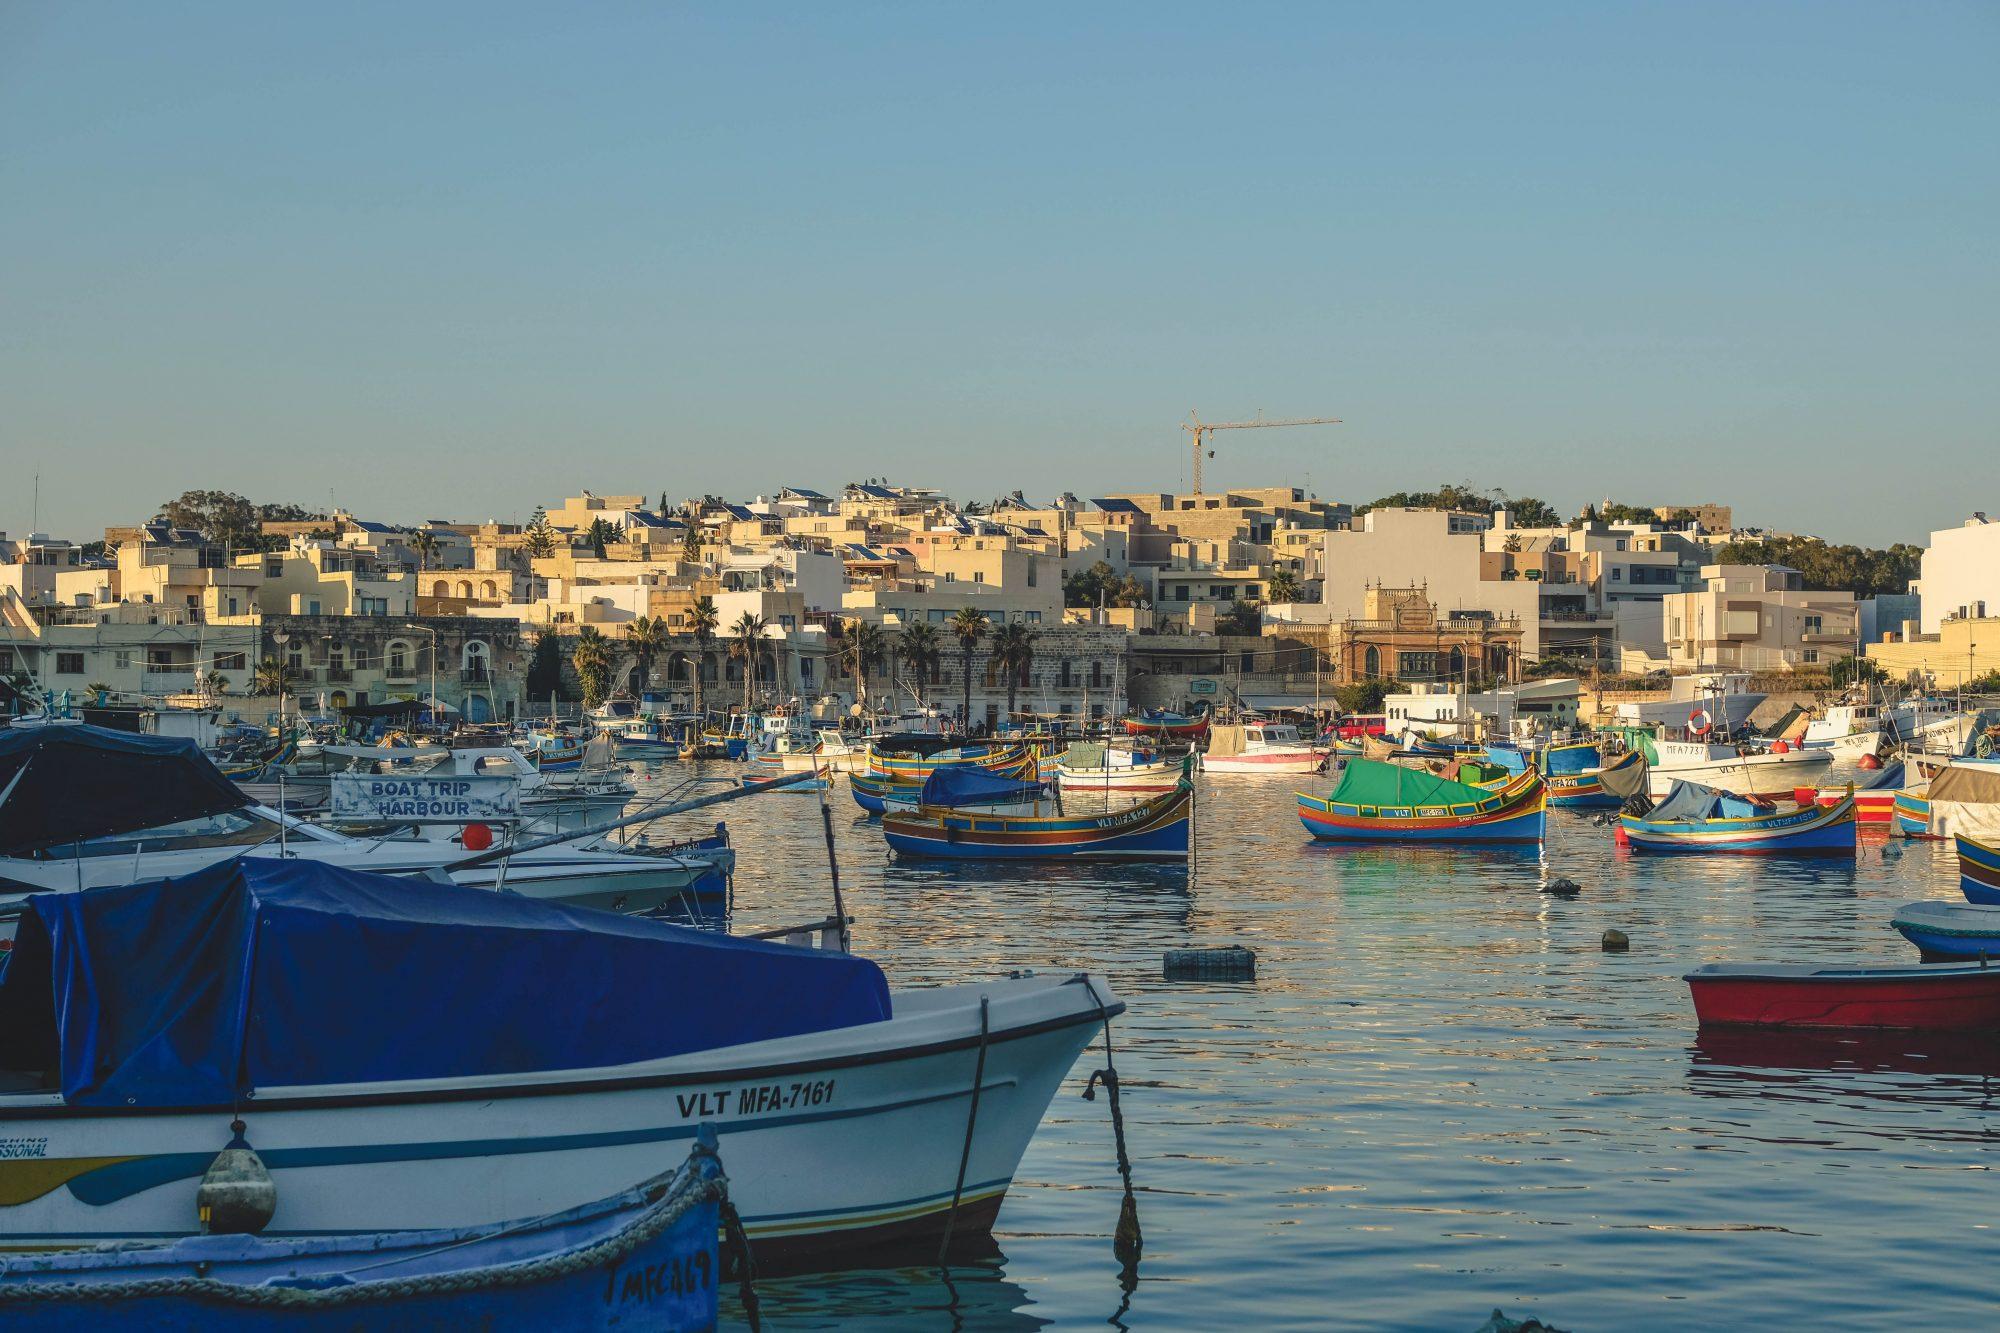 Port de Marsalokx